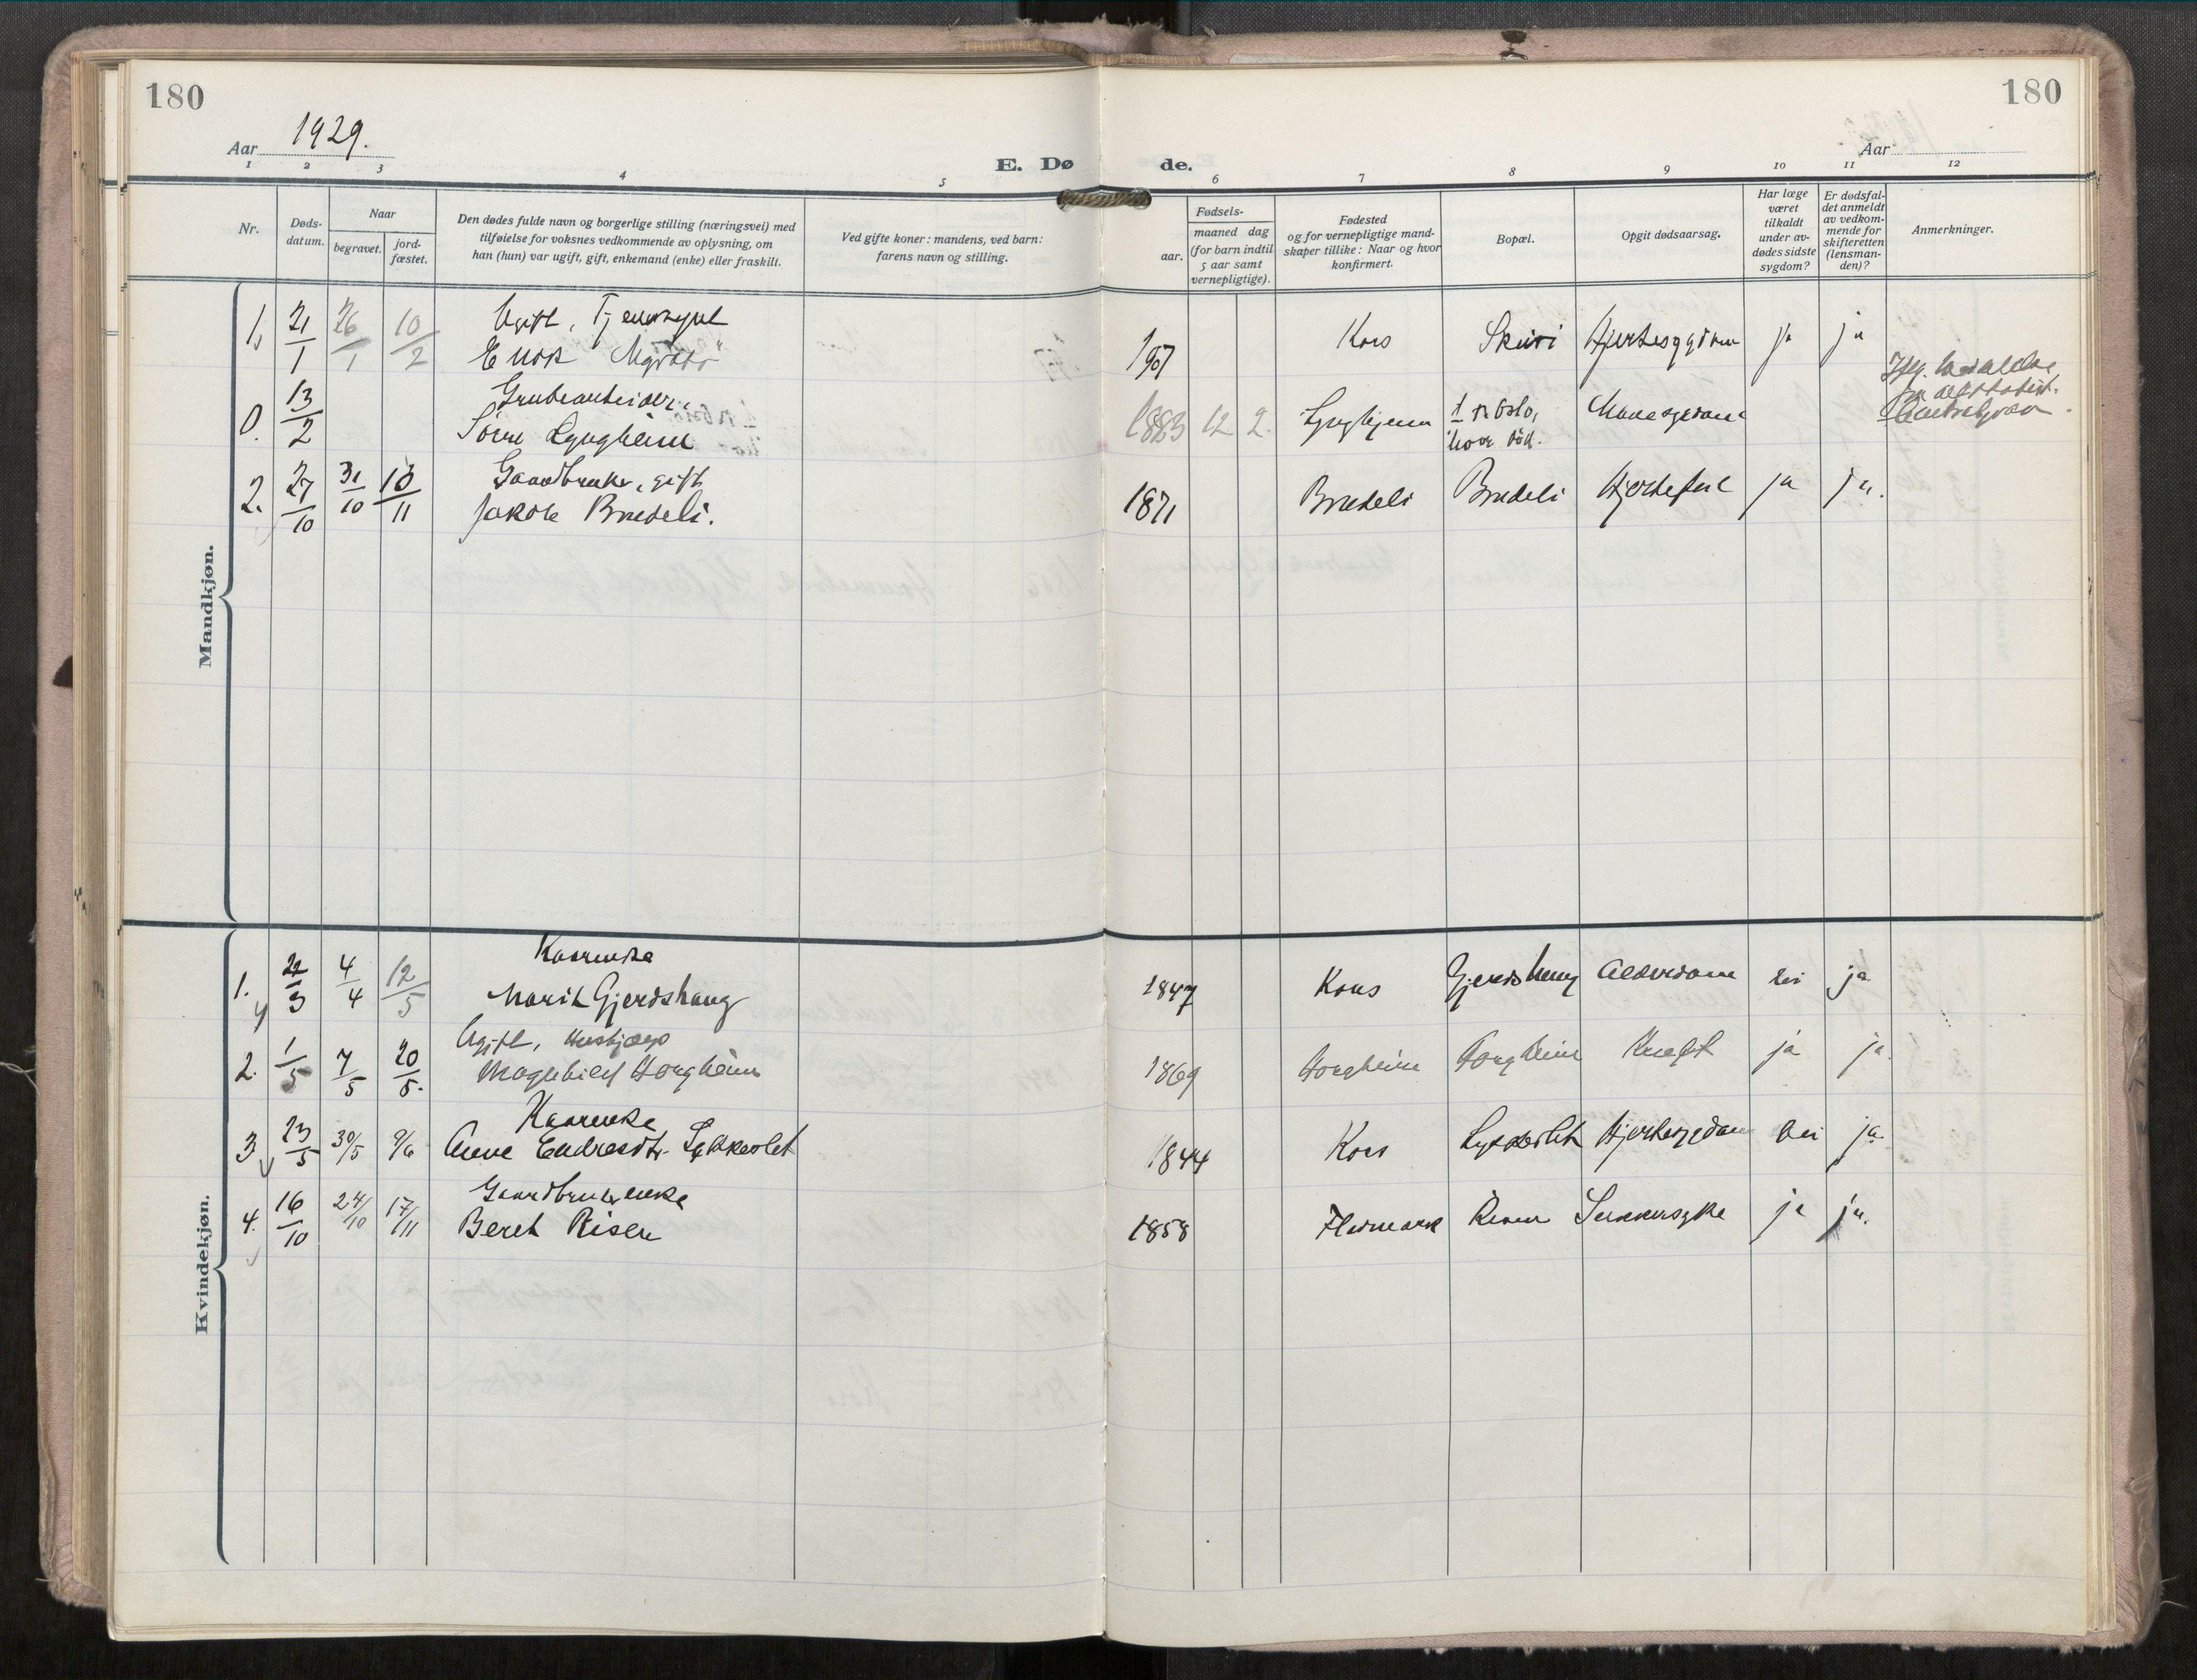 SAT, Grytten sokneprestkontor, Ministerialbok nr. 546A04, 1919-1956, s. 180